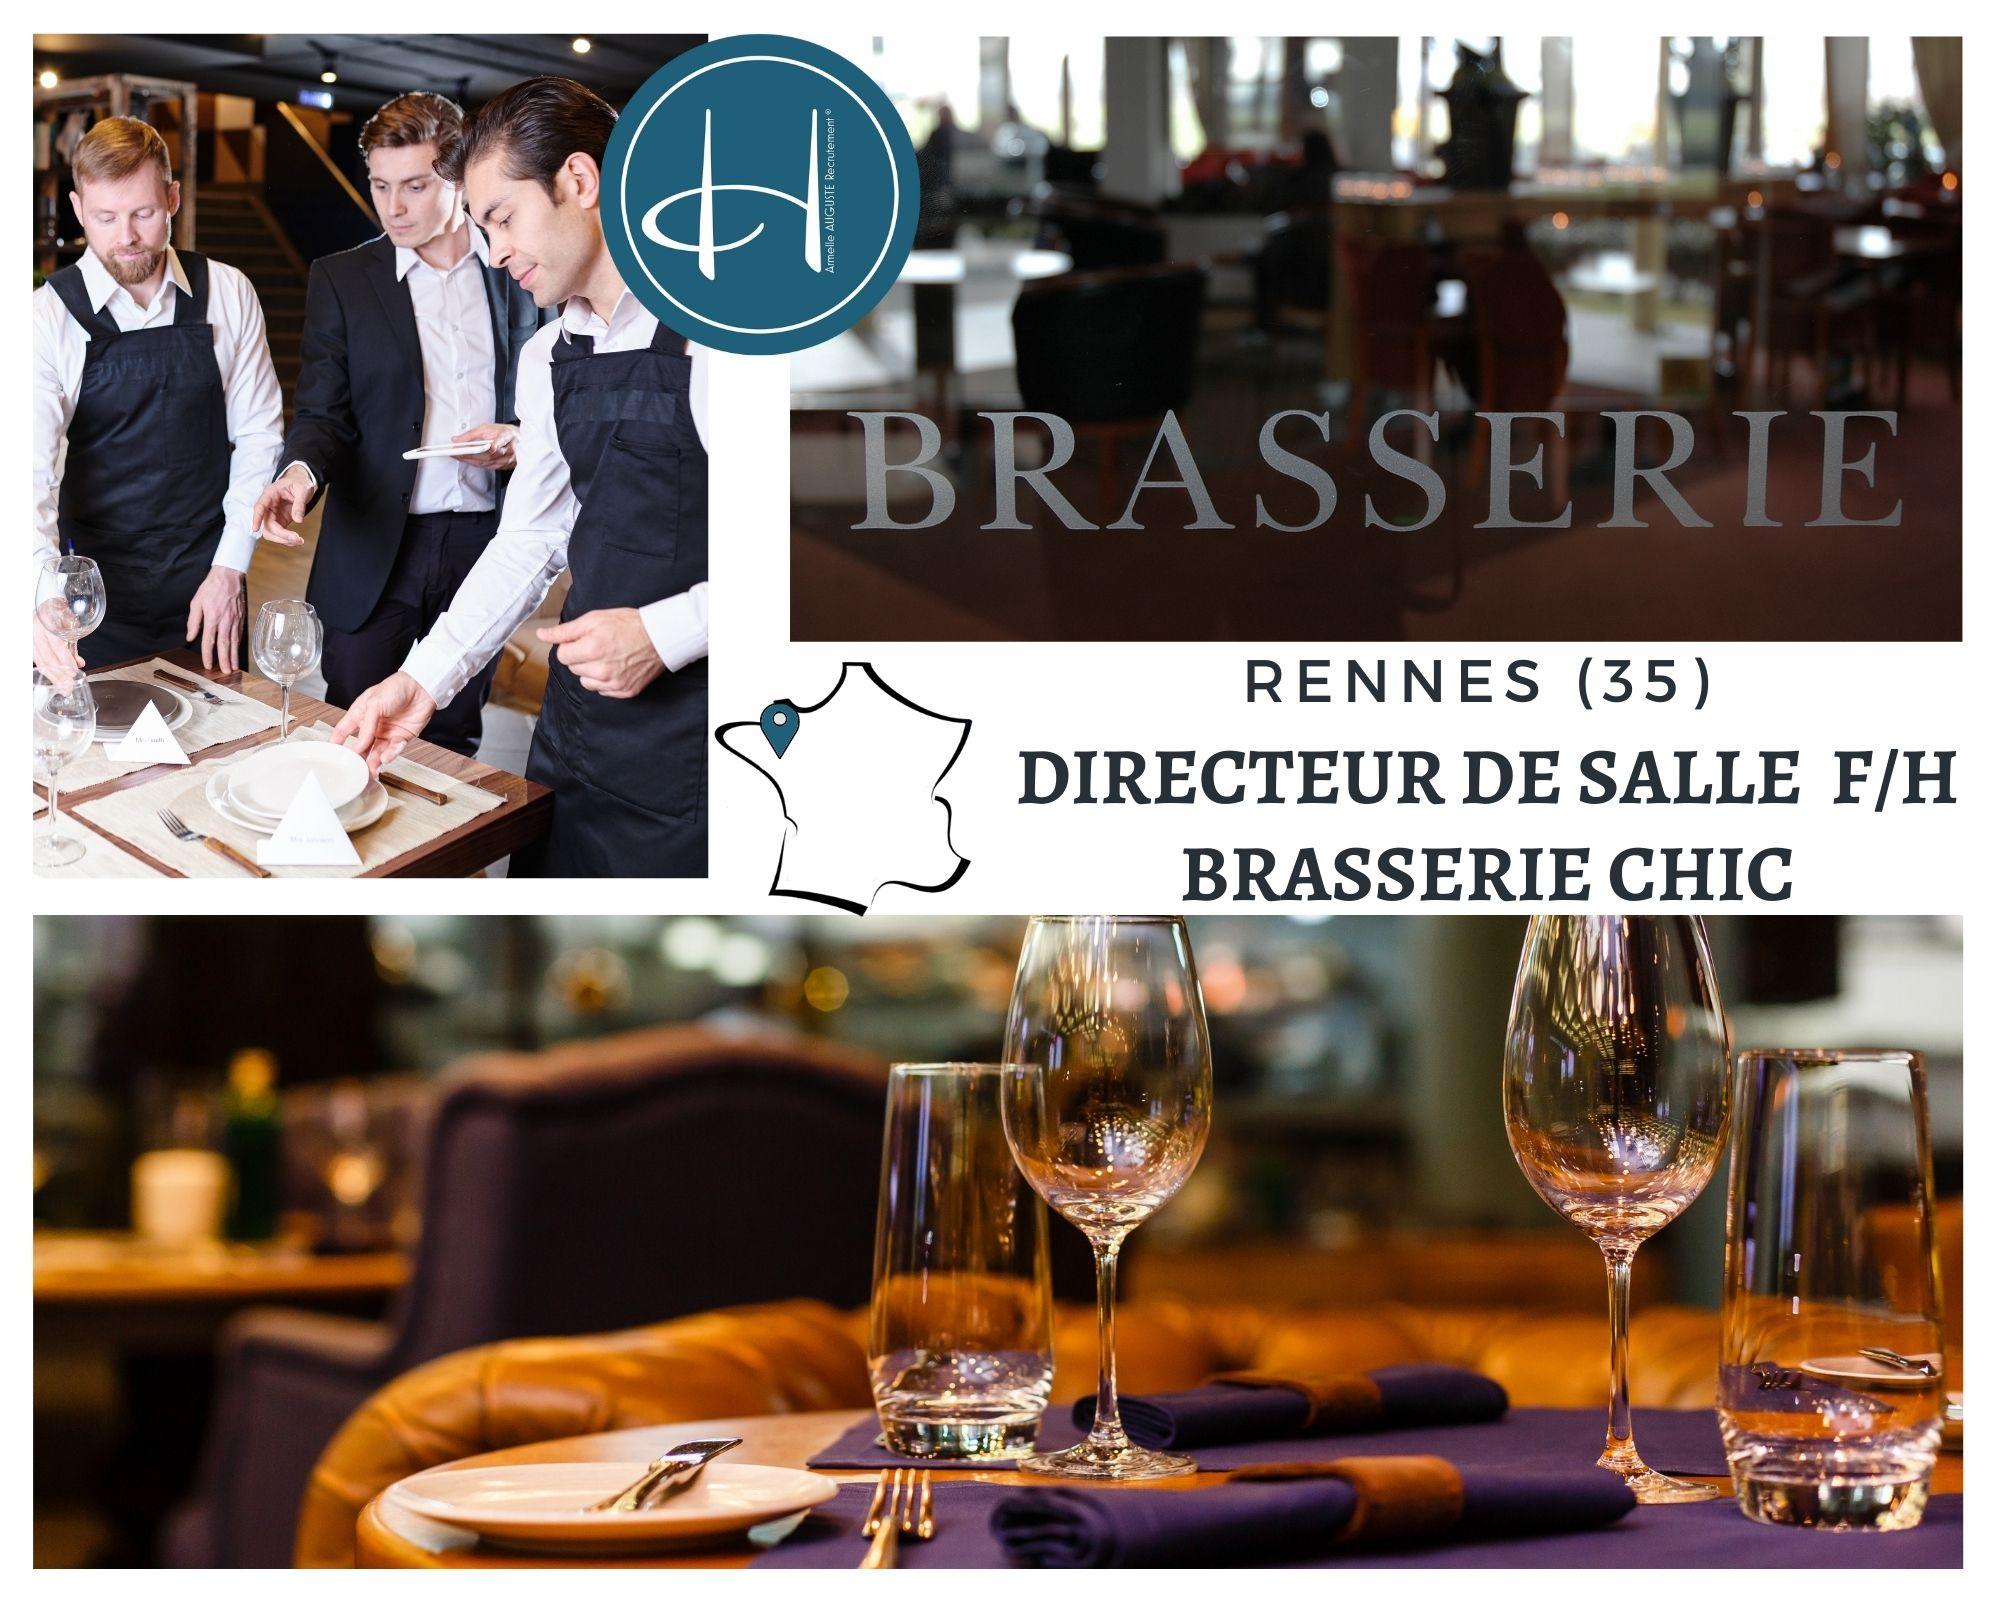 Recrutement: Directeur Brasserie Chic F/H chez Armelle AUGUSTE Recrutement® à Rennes